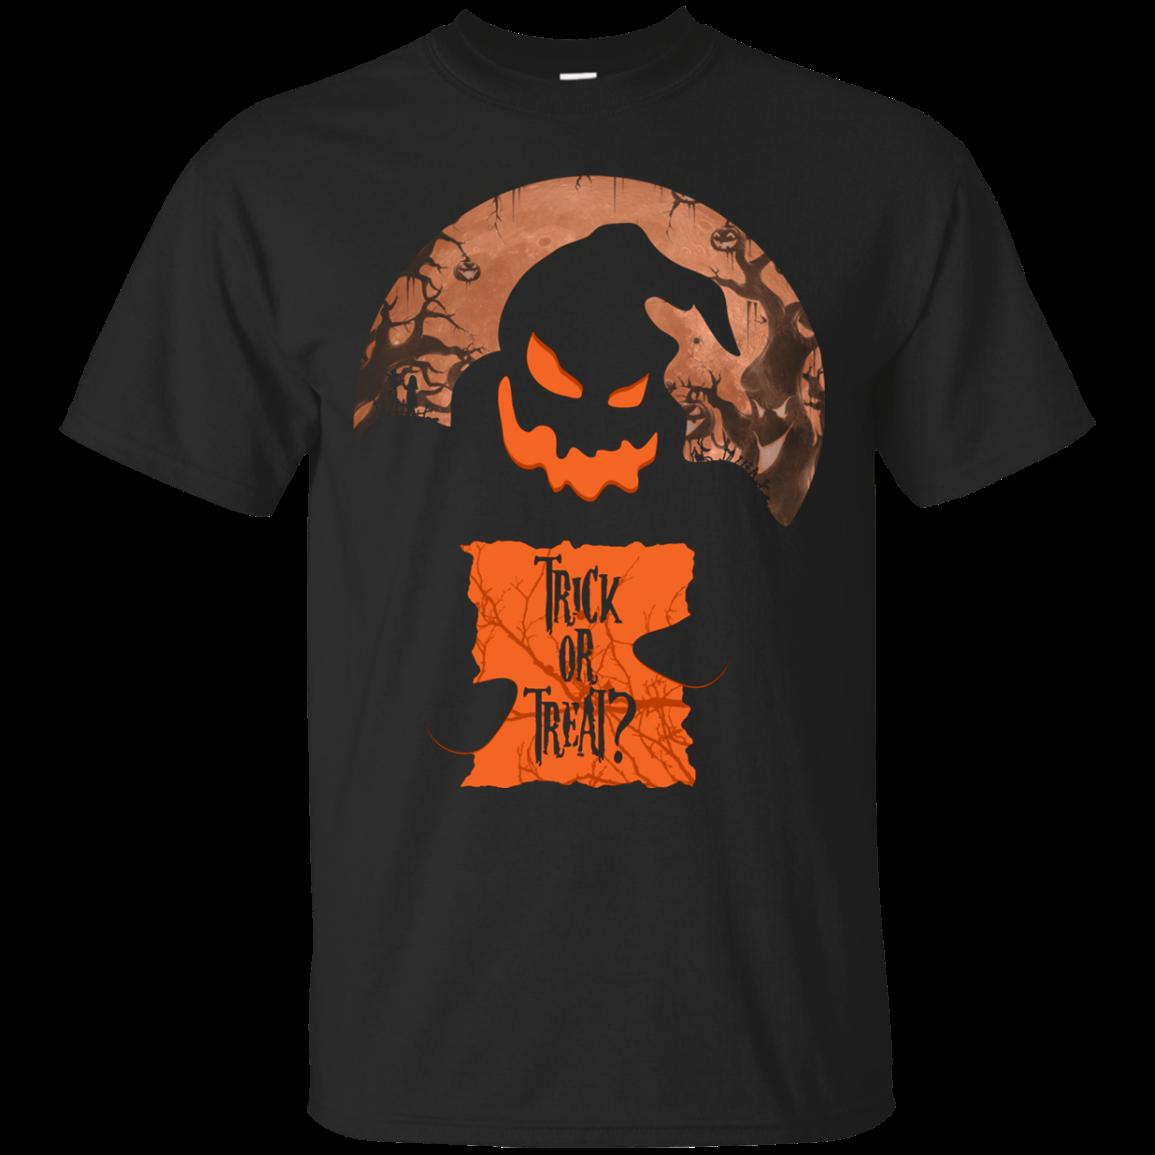 Buy Trick Or Treat Halloween T Shirt Tula Store